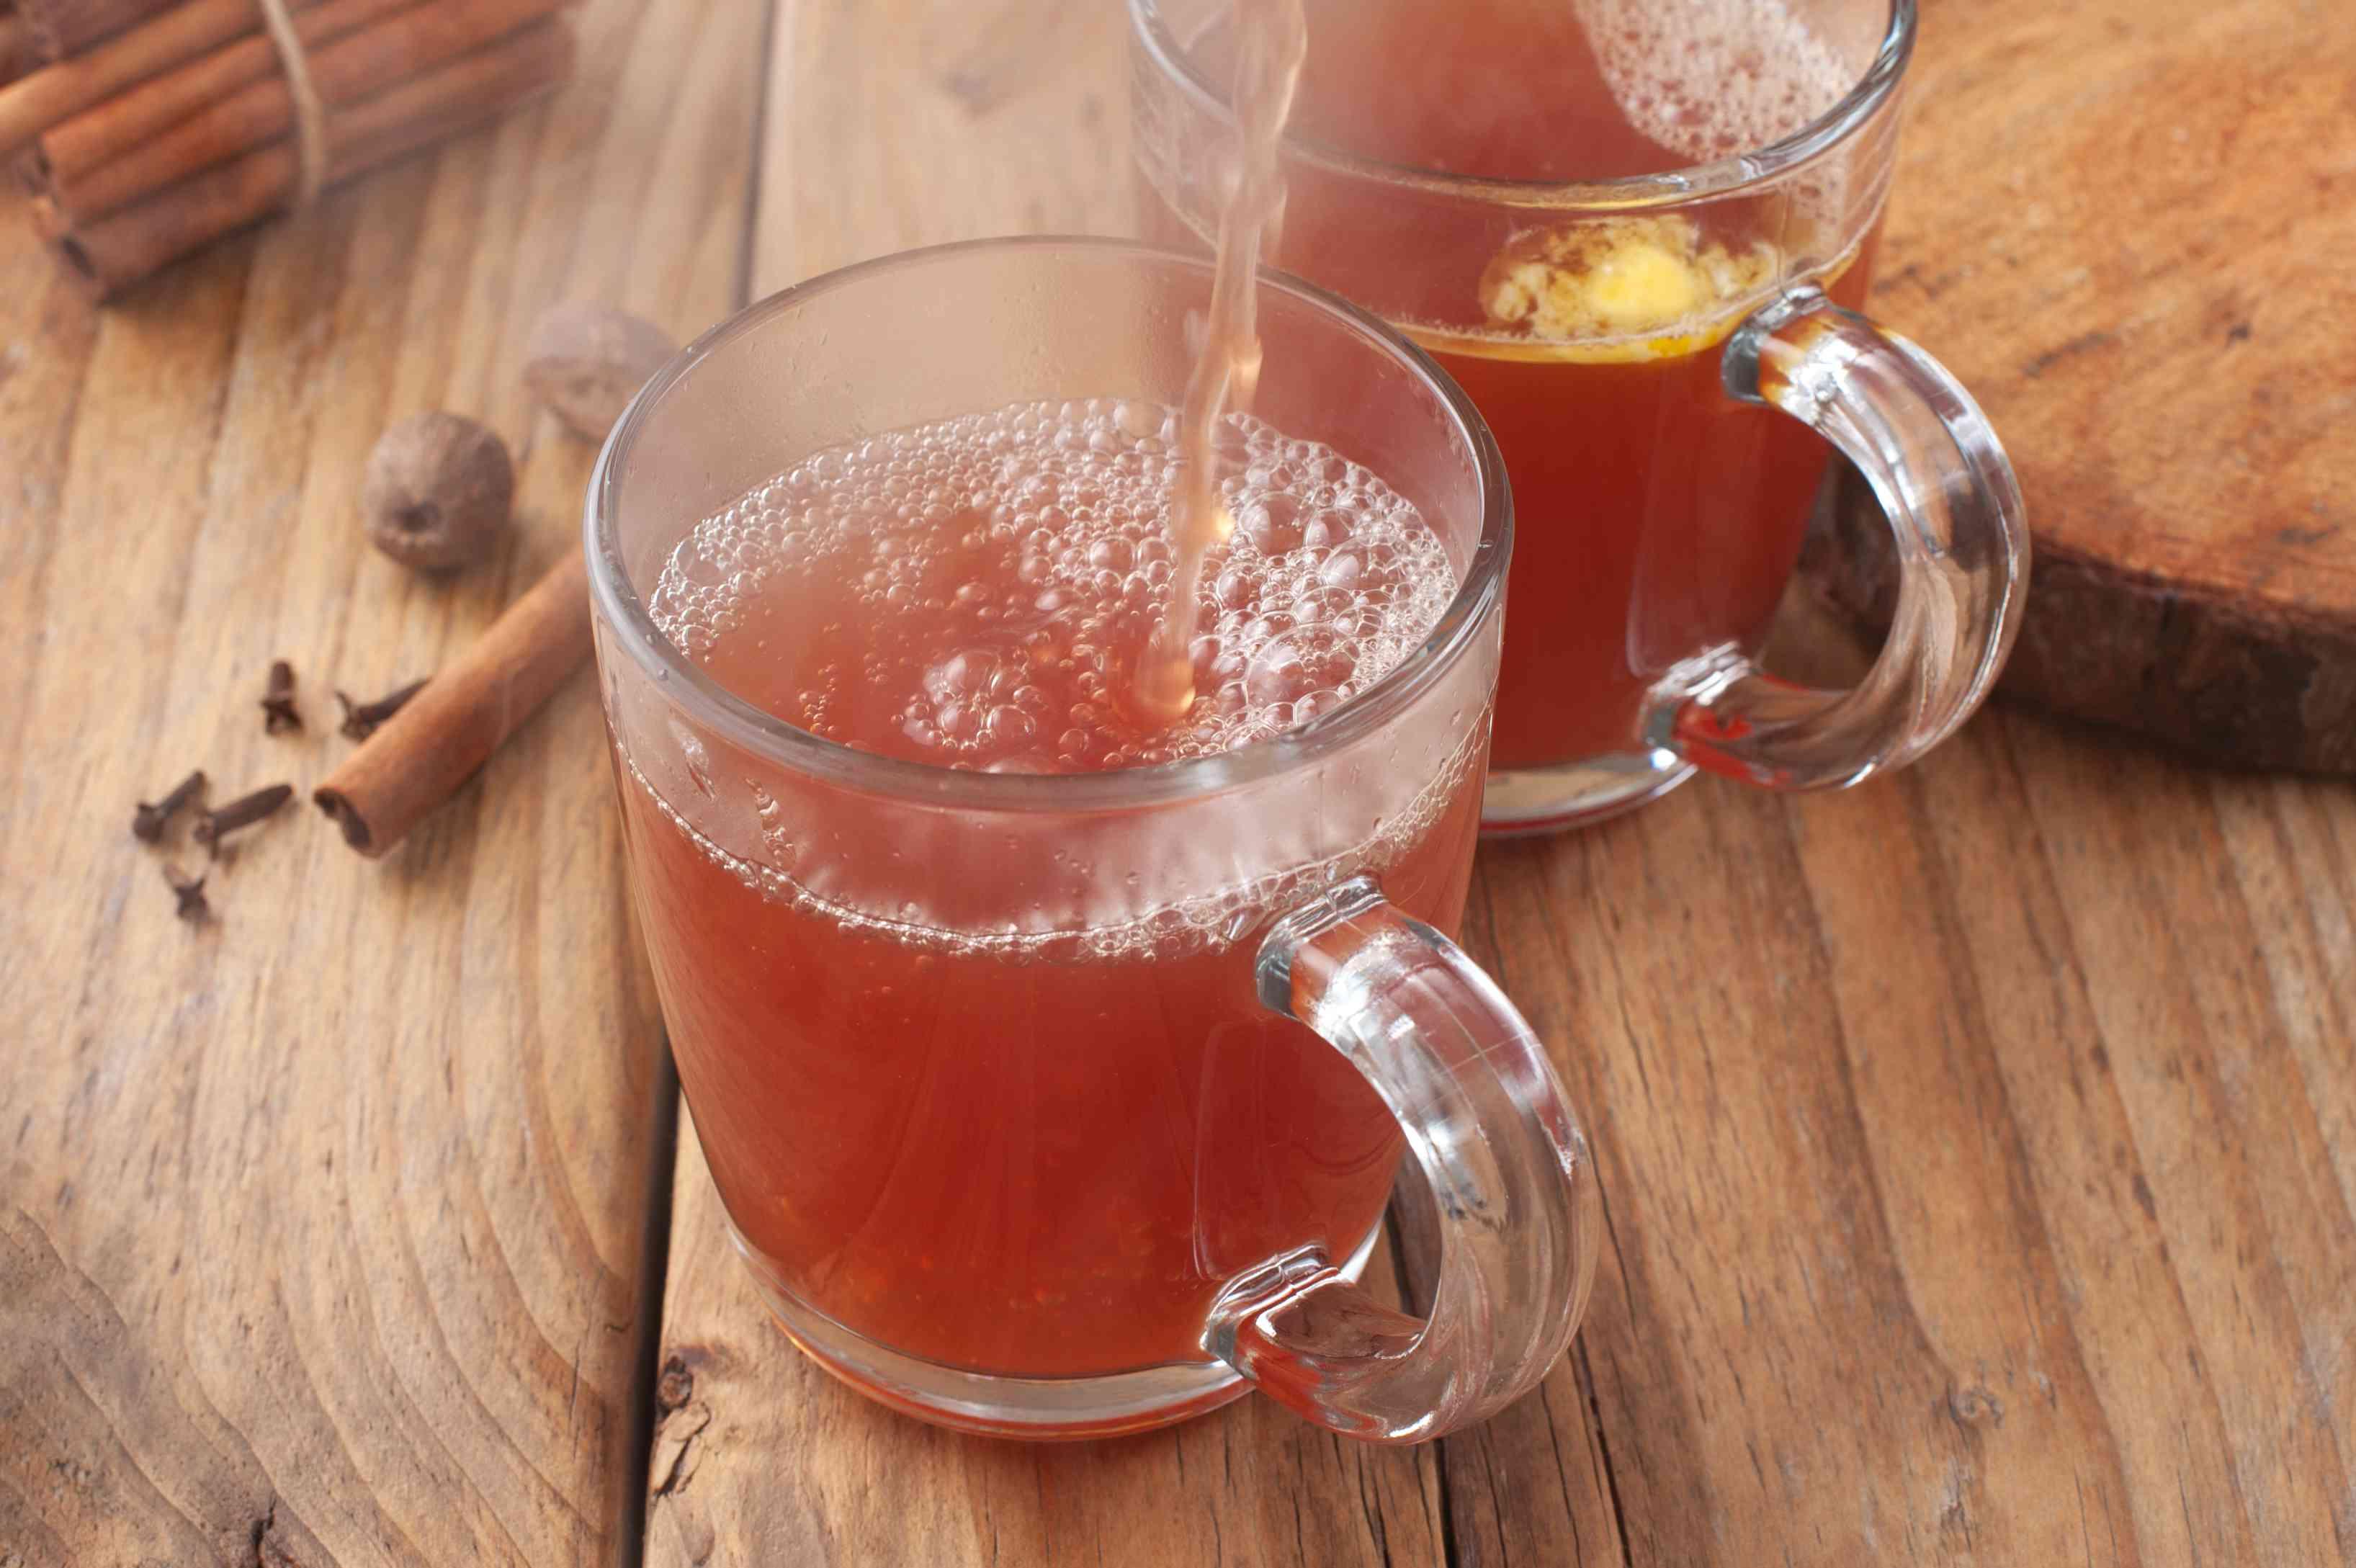 Pour into mugs